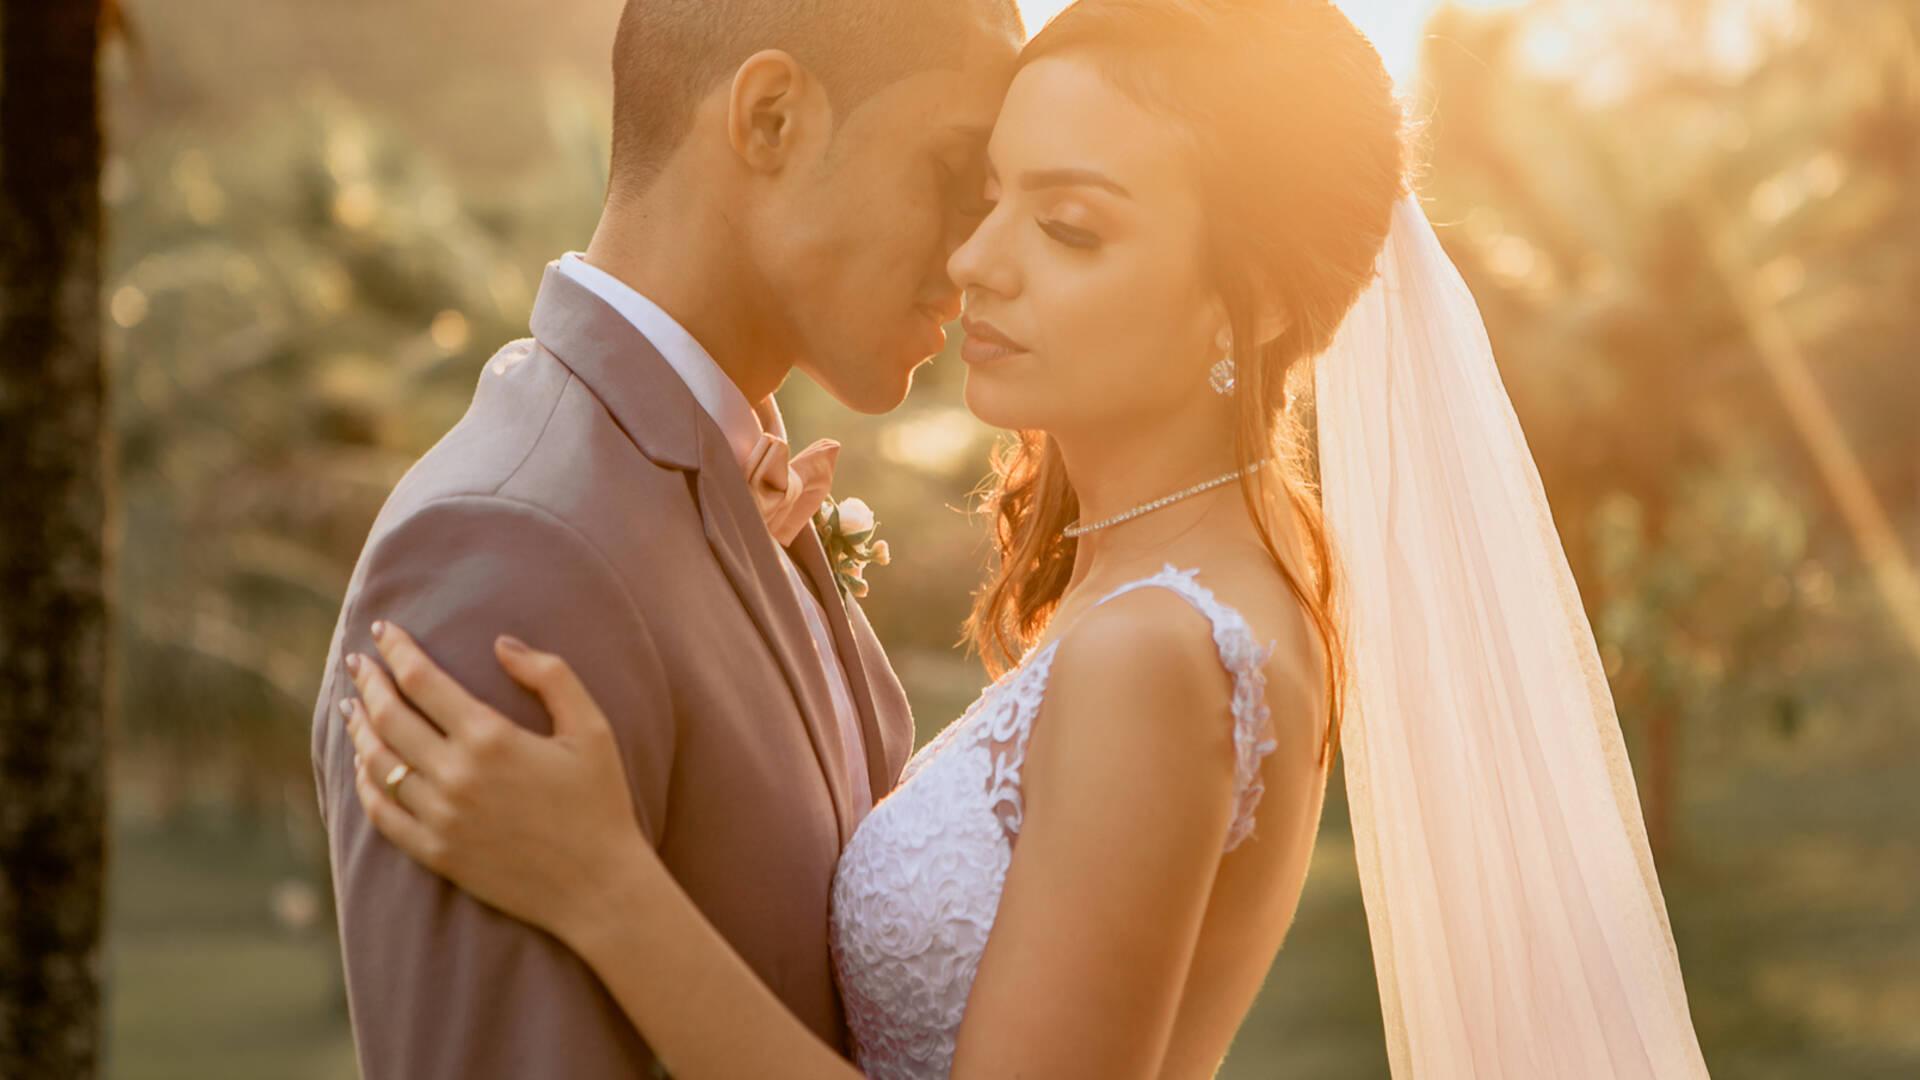 Casamento de Jasmini e Douglas